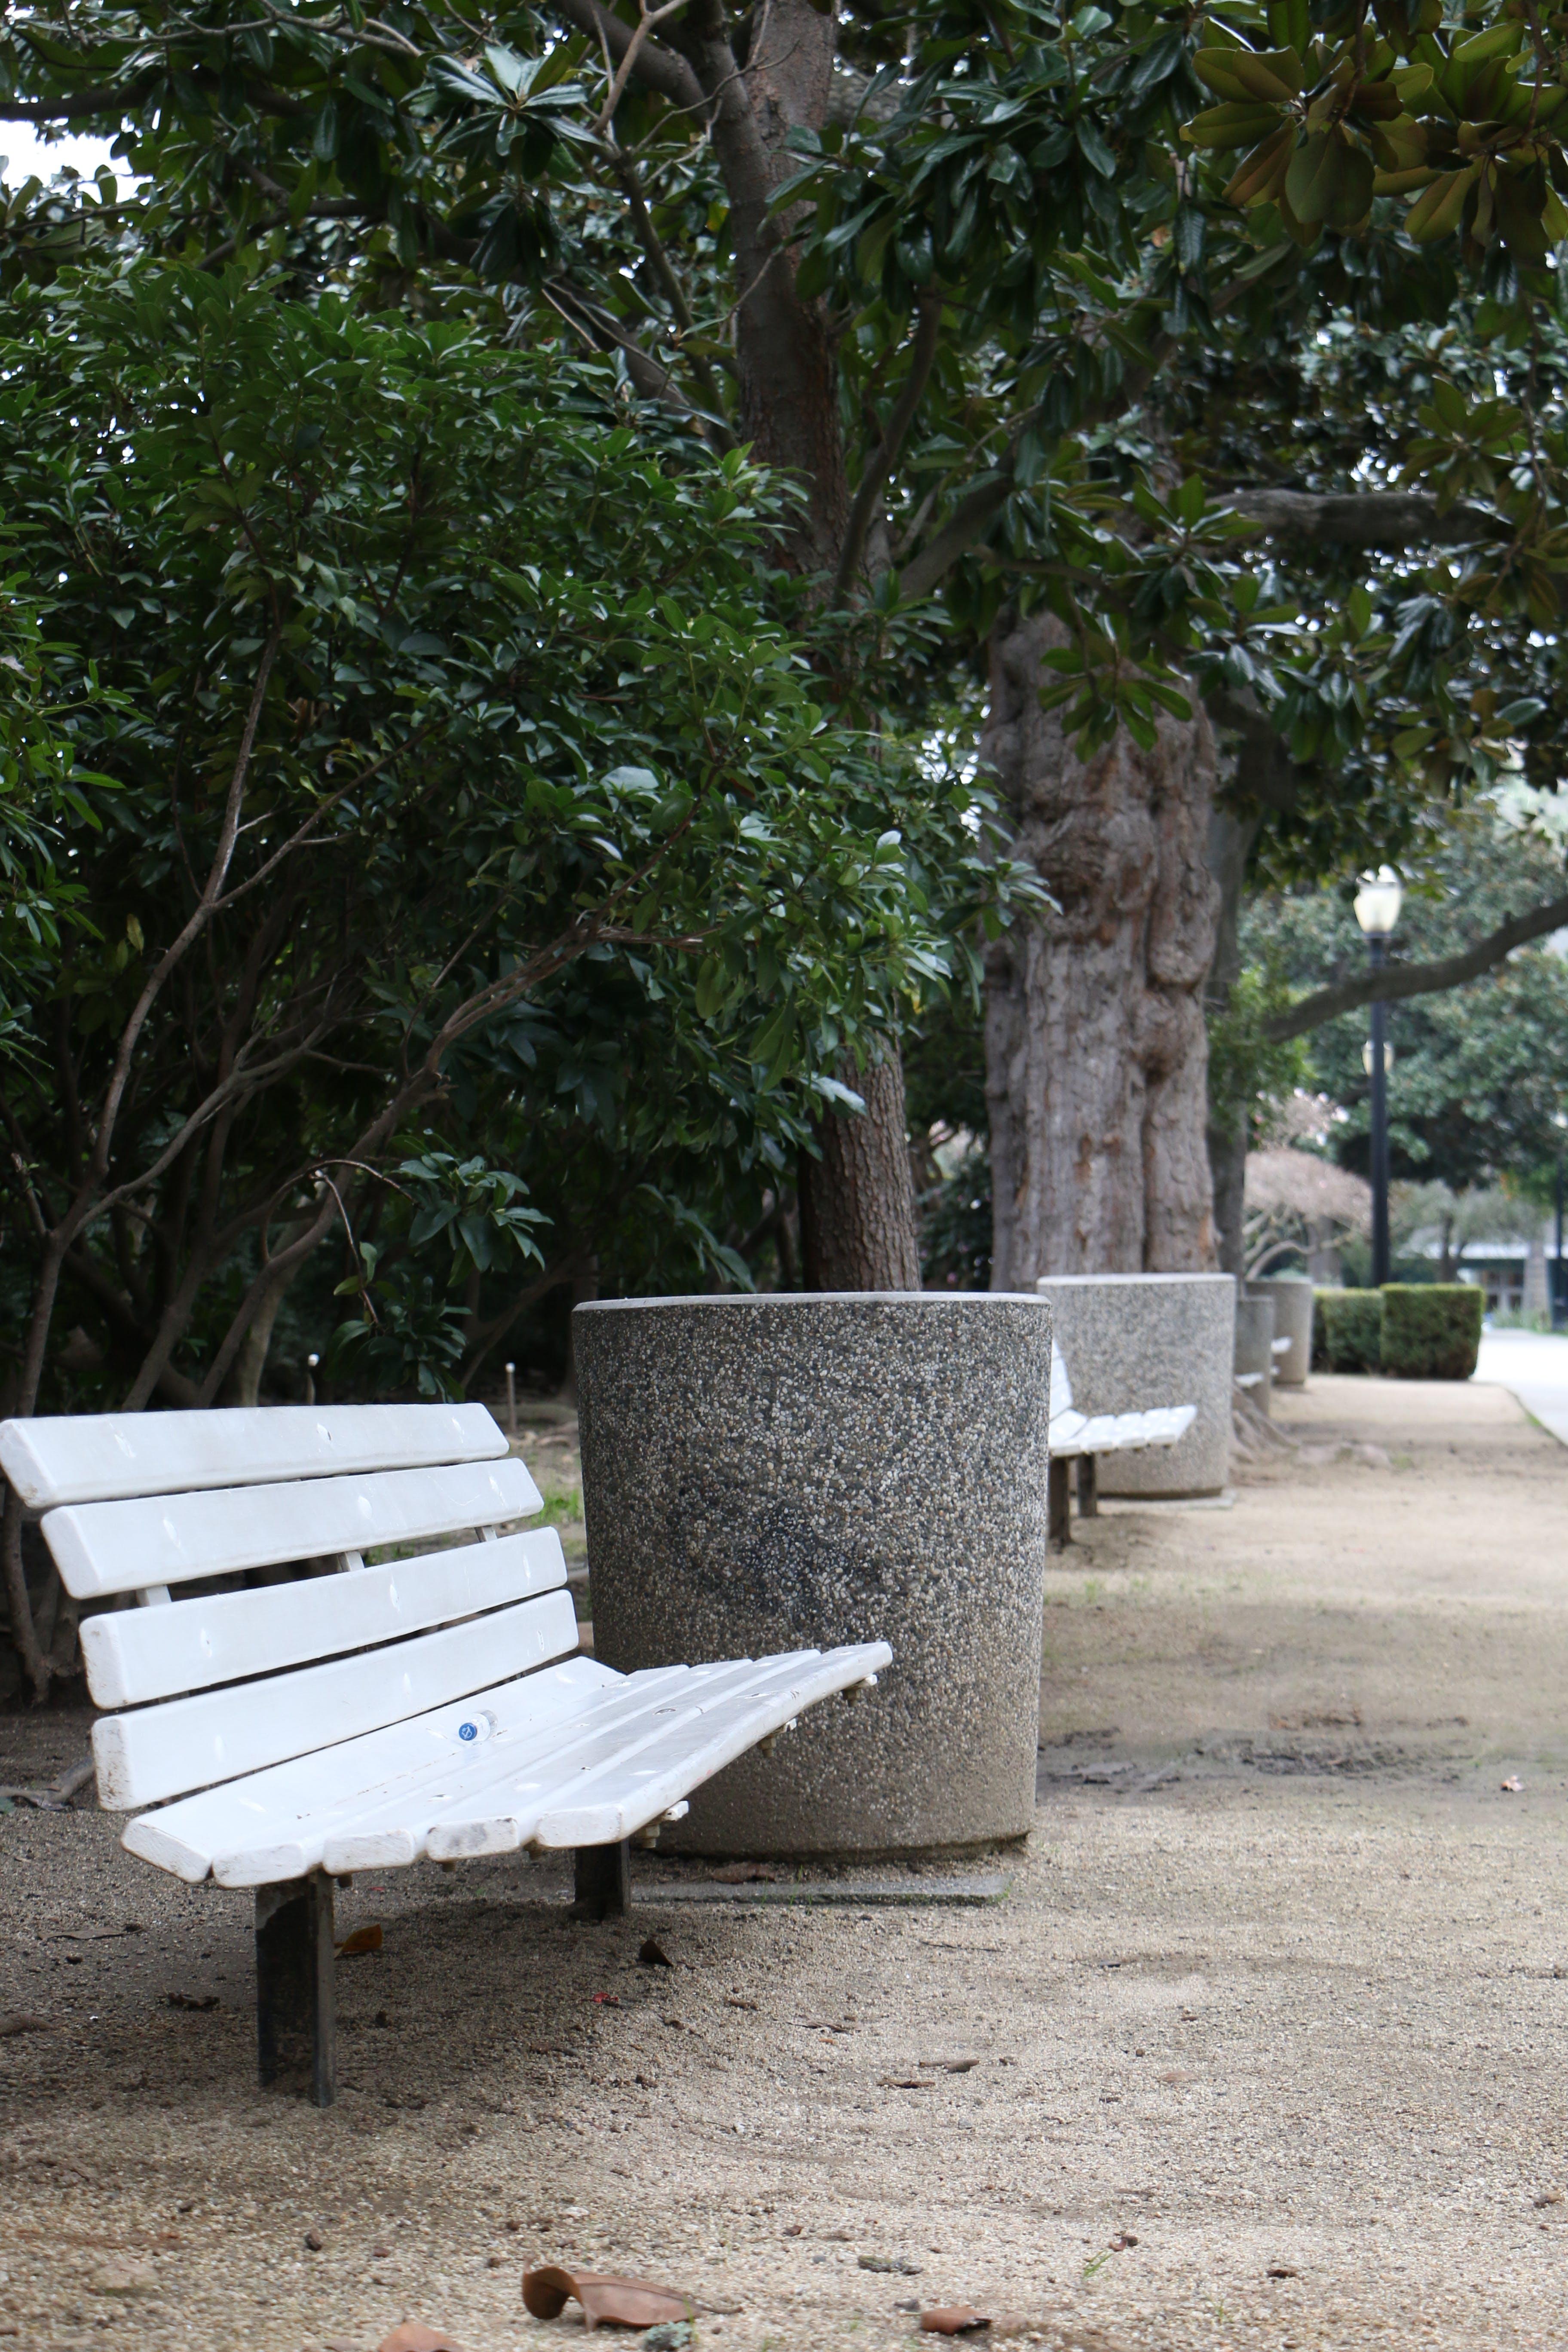 Free stock photo of bench, bushes, park, tree